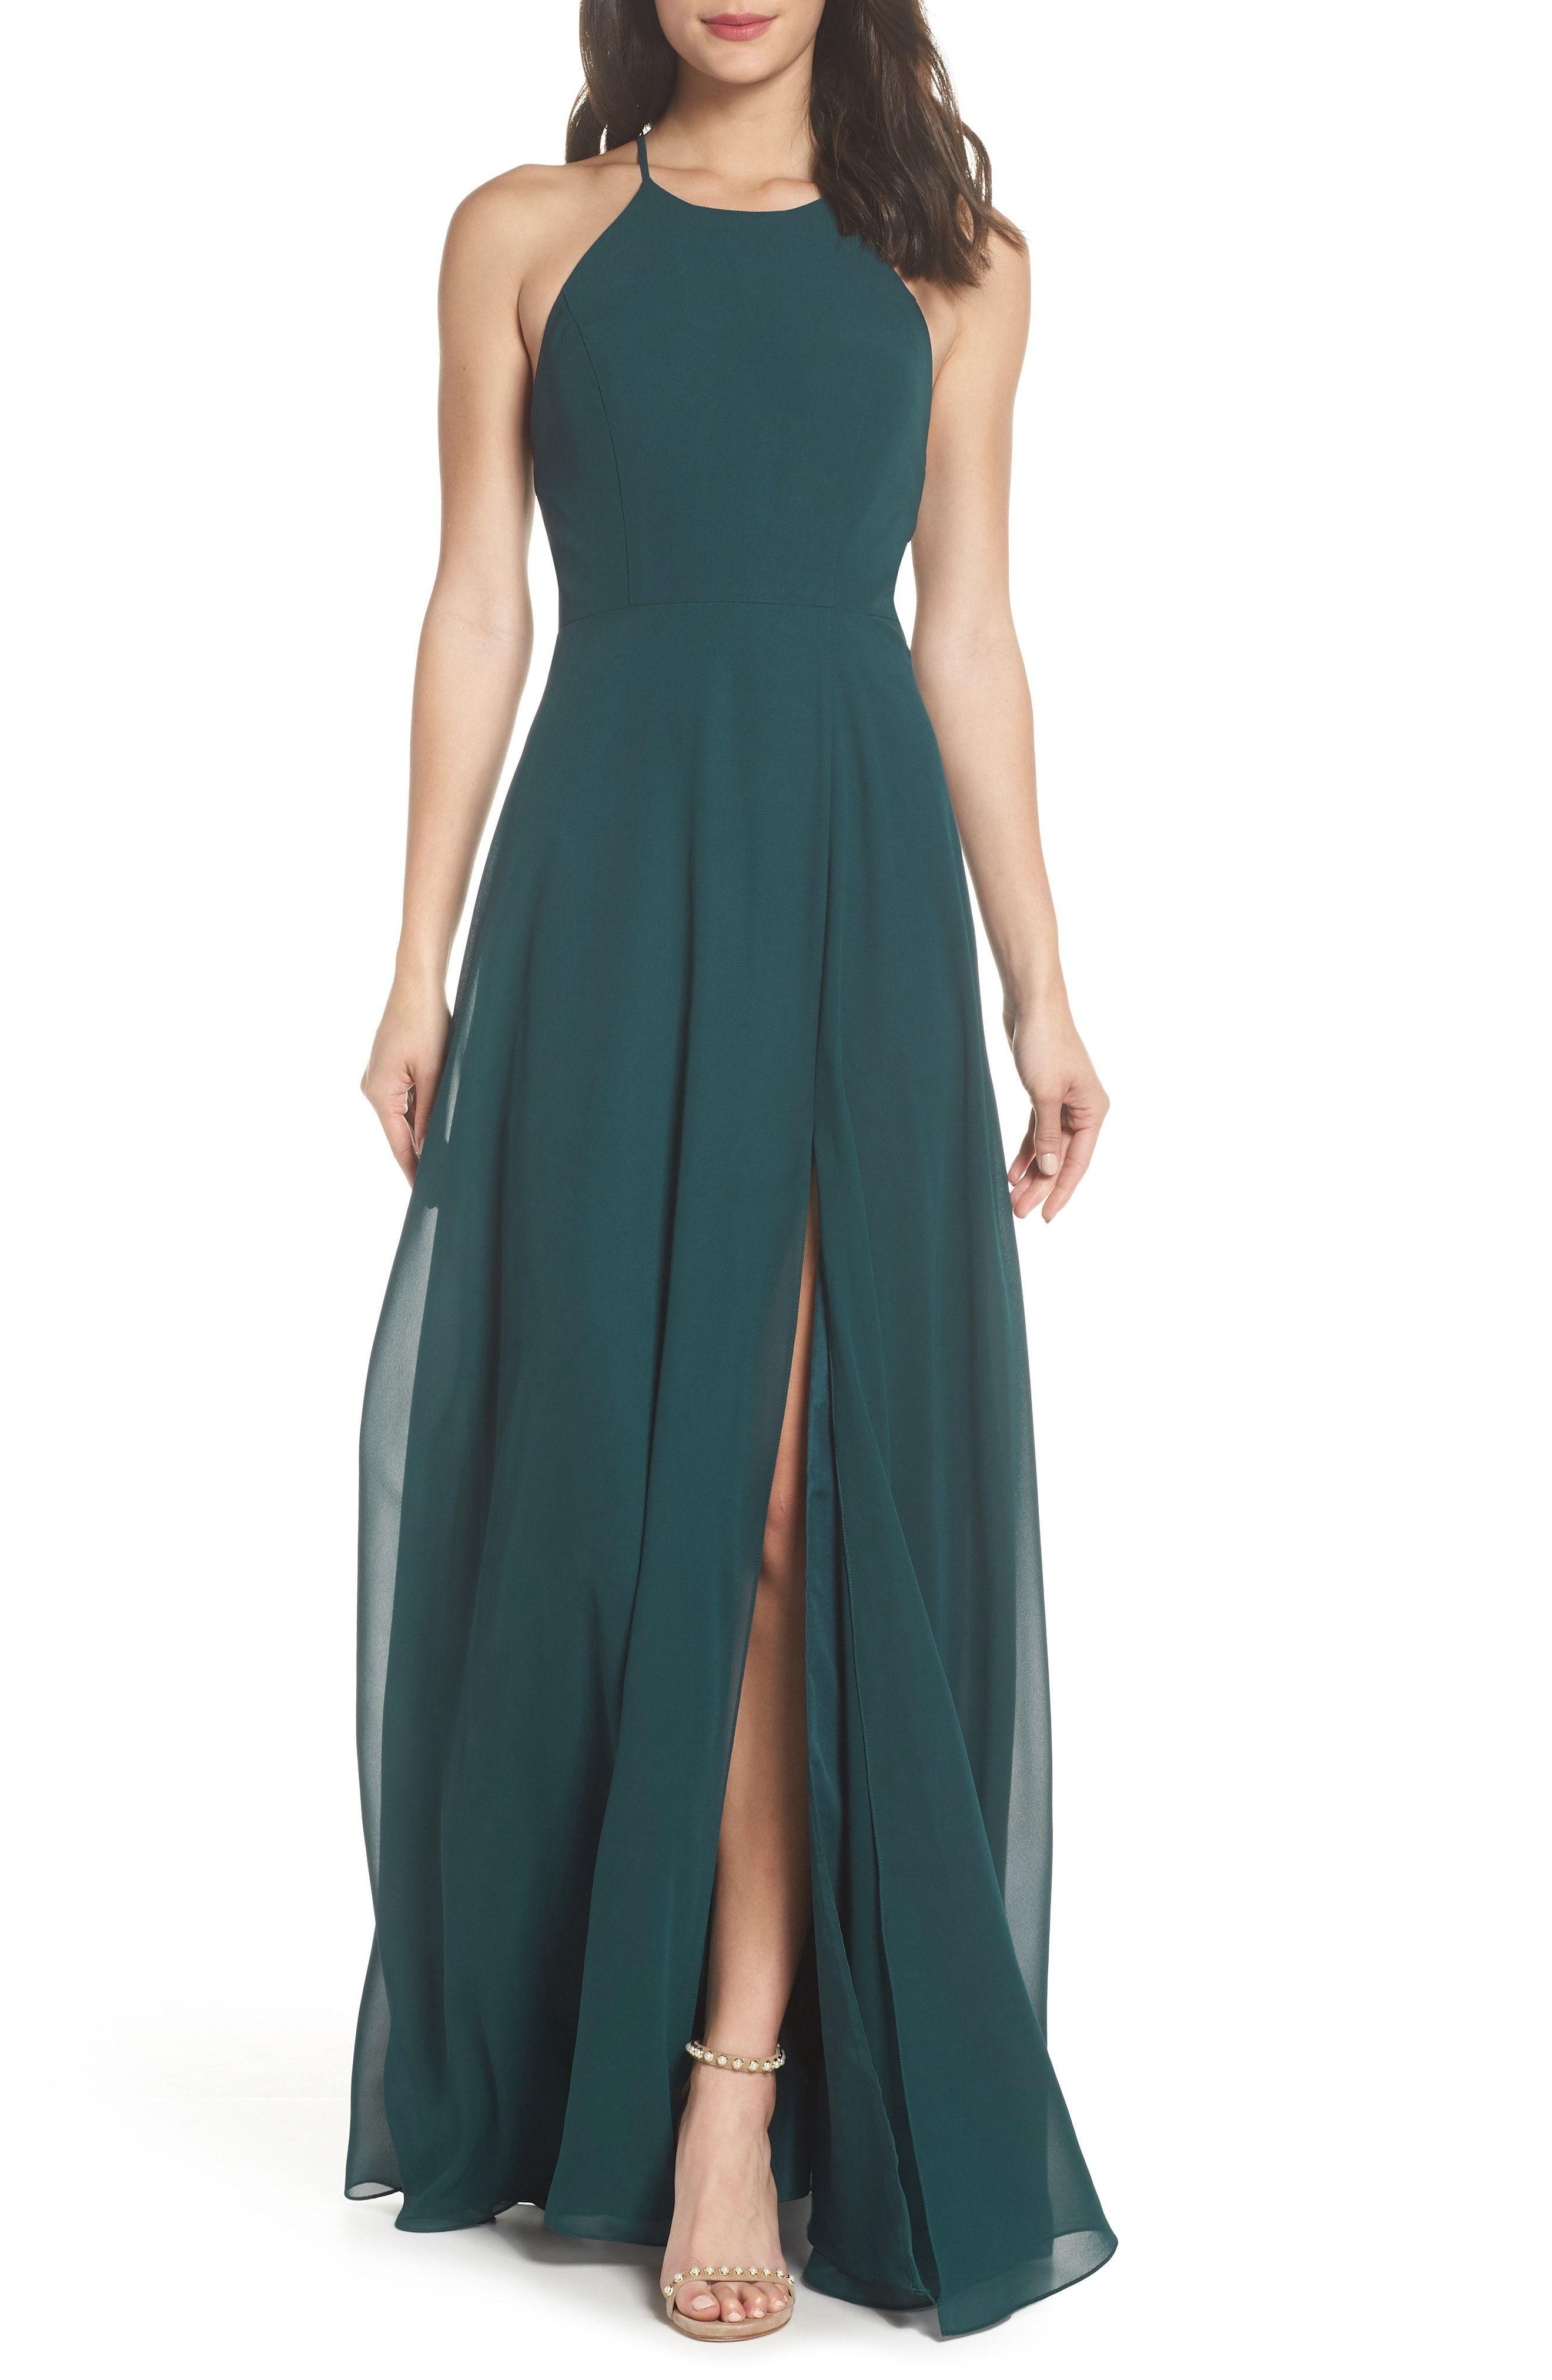 Green bridesmaids dress  Stunning bluegreen bridesmaid dresses Jenny Yoo  Kayla in Caspian